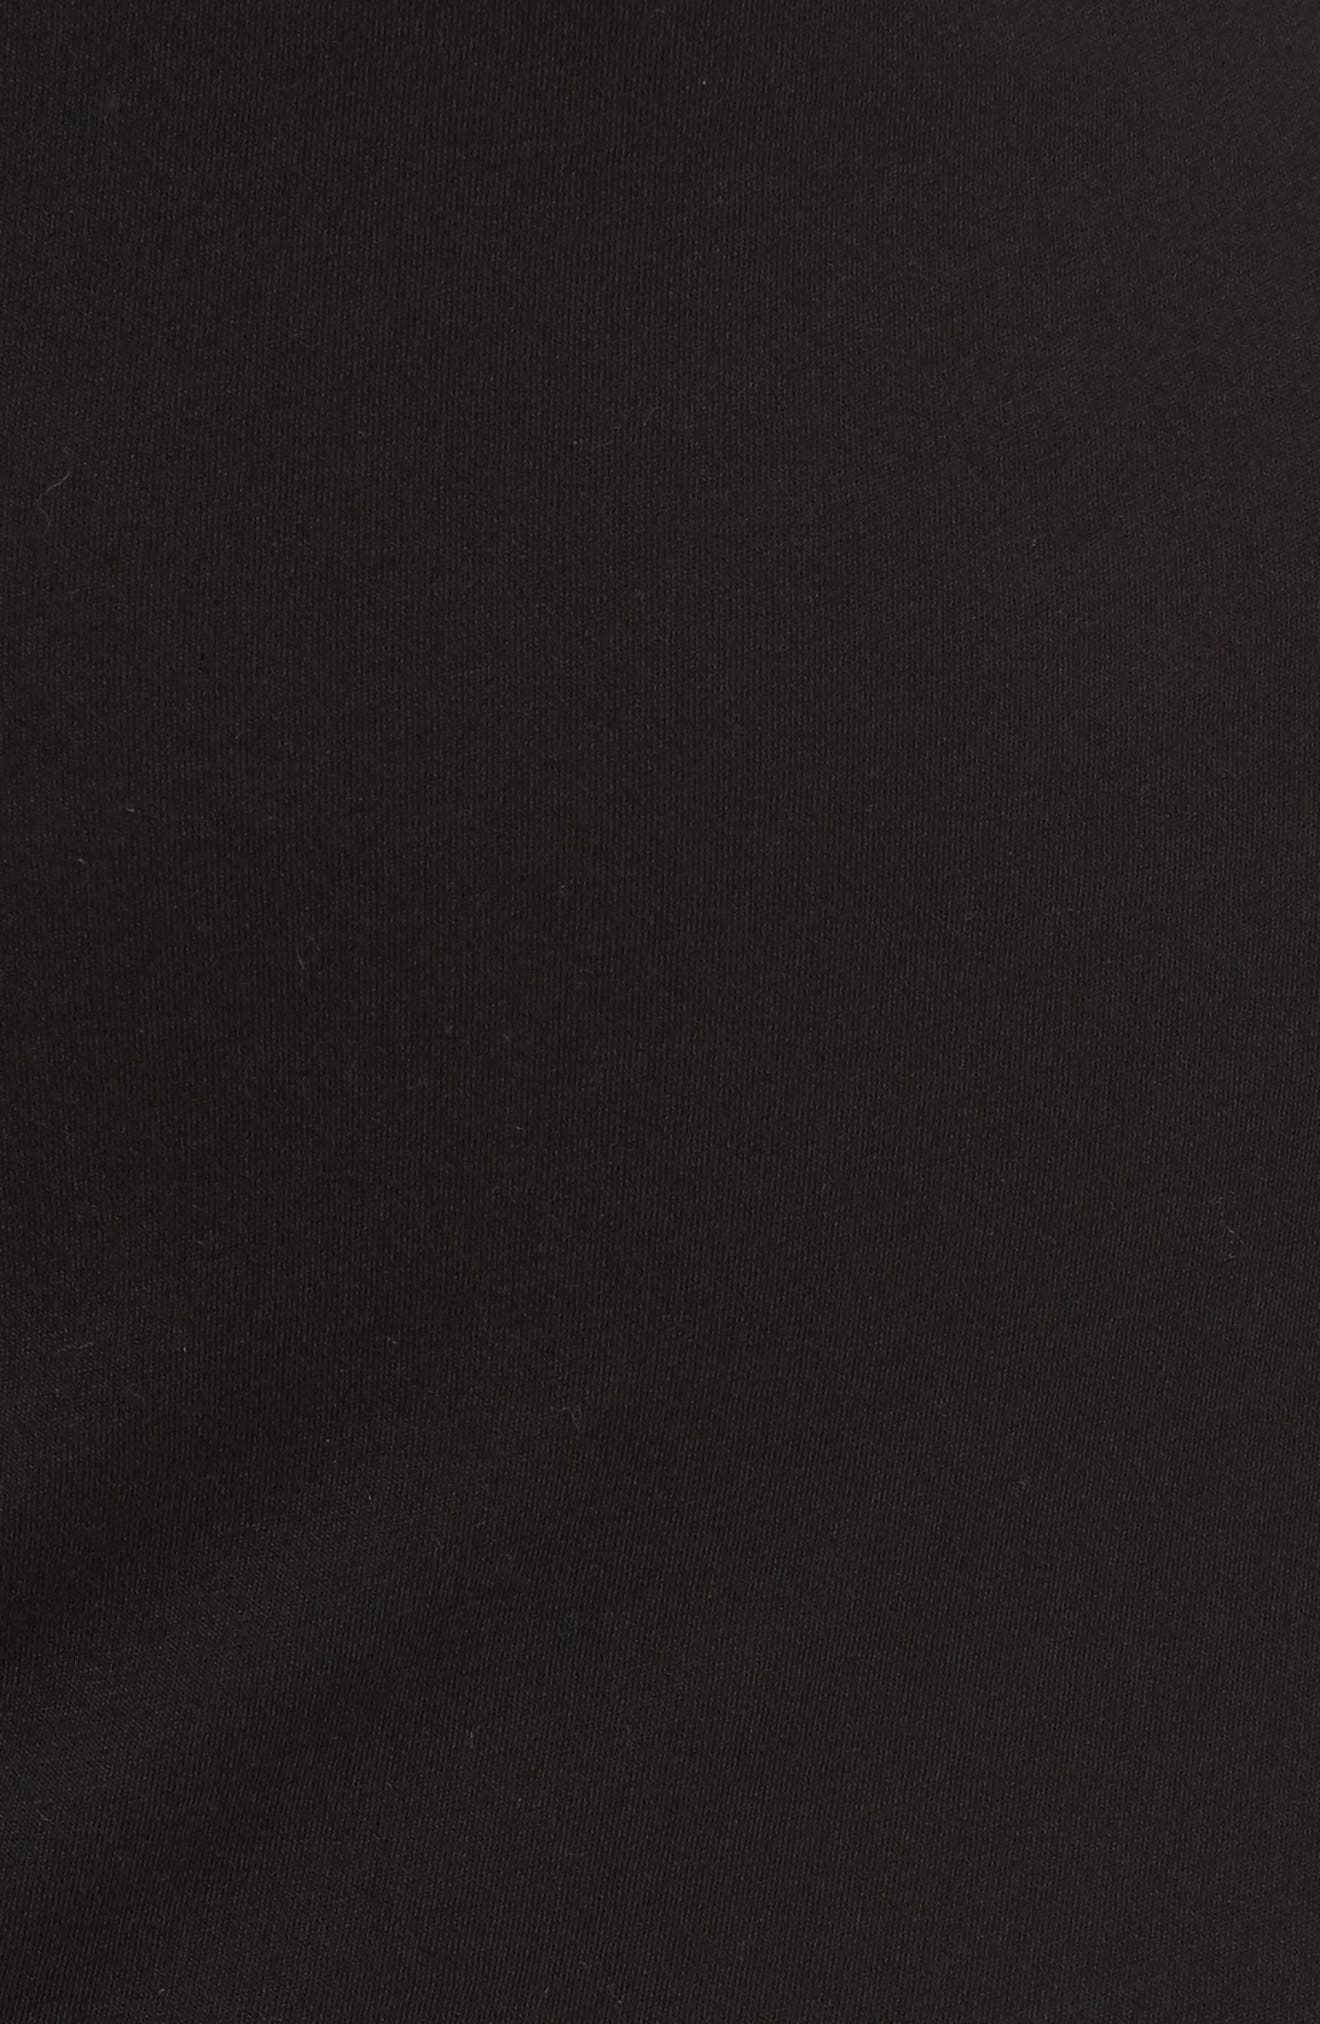 Cold Shoulder Sheath Dress,                             Alternate thumbnail 5, color,                             001